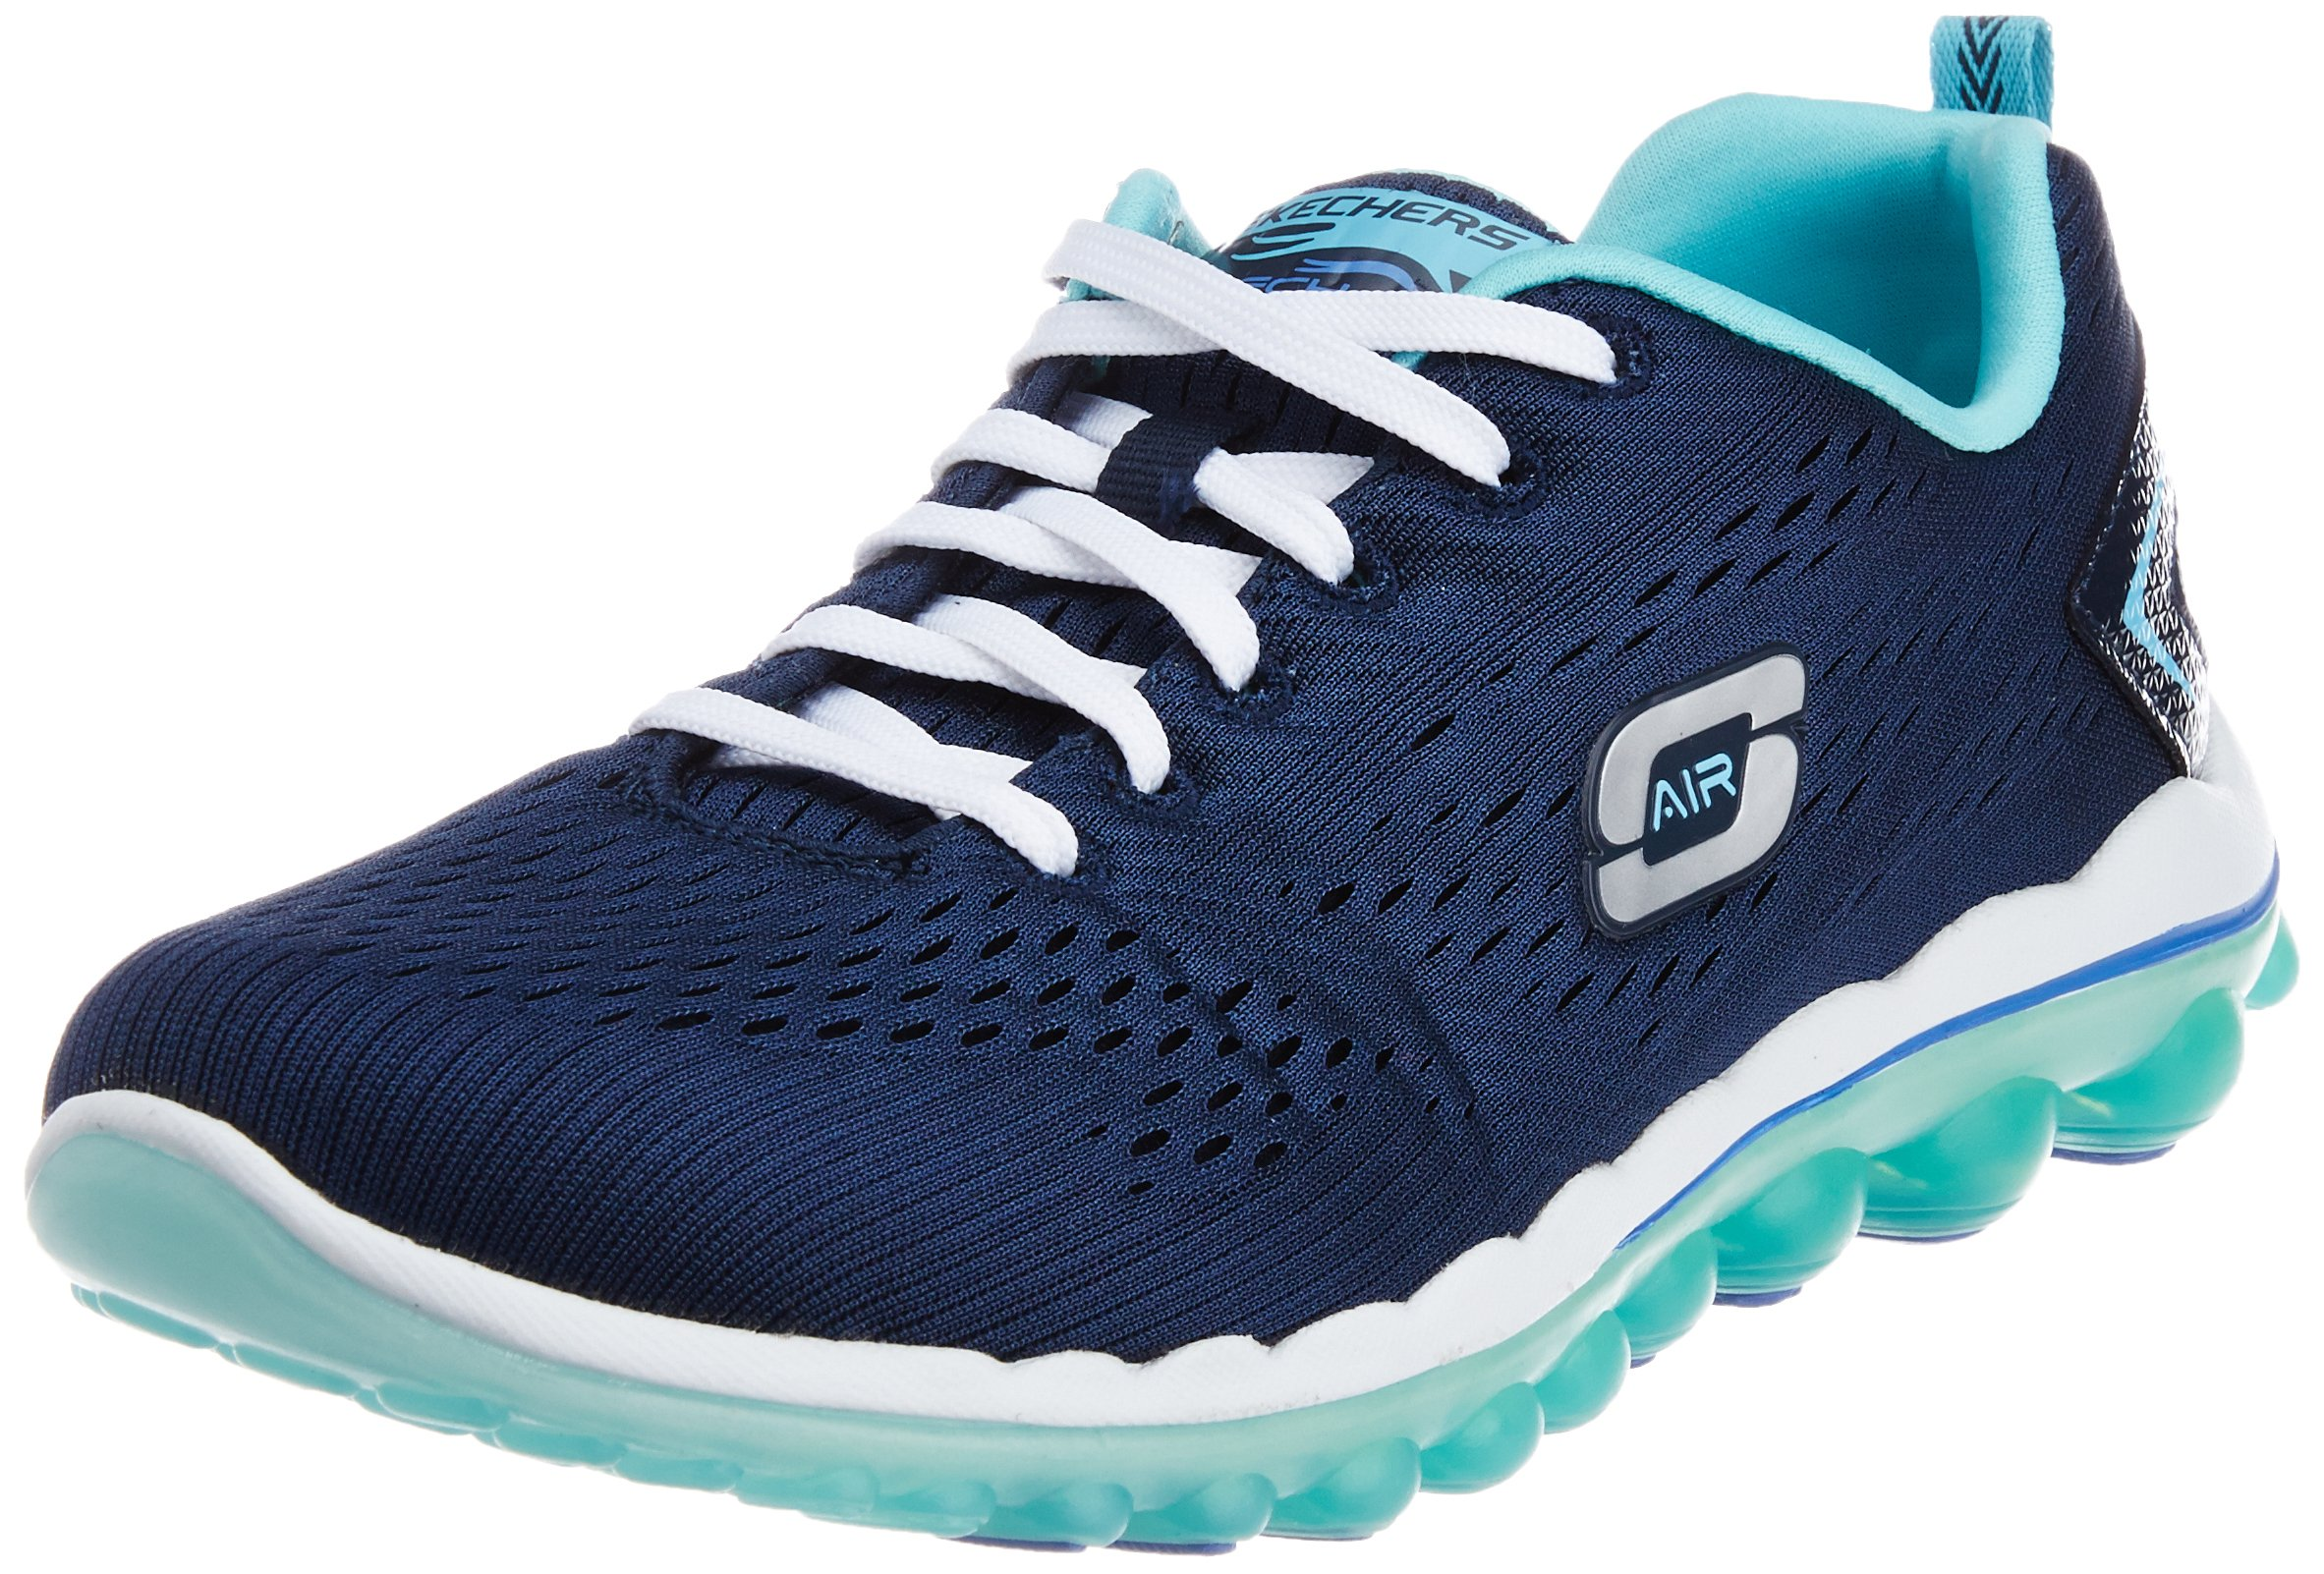 9e7b47d54a Galleon - Skechers Sport Women's Skech Air Aim High Fashion Sneaker,Navy  Mesh/Light Blue Trim,9 M US